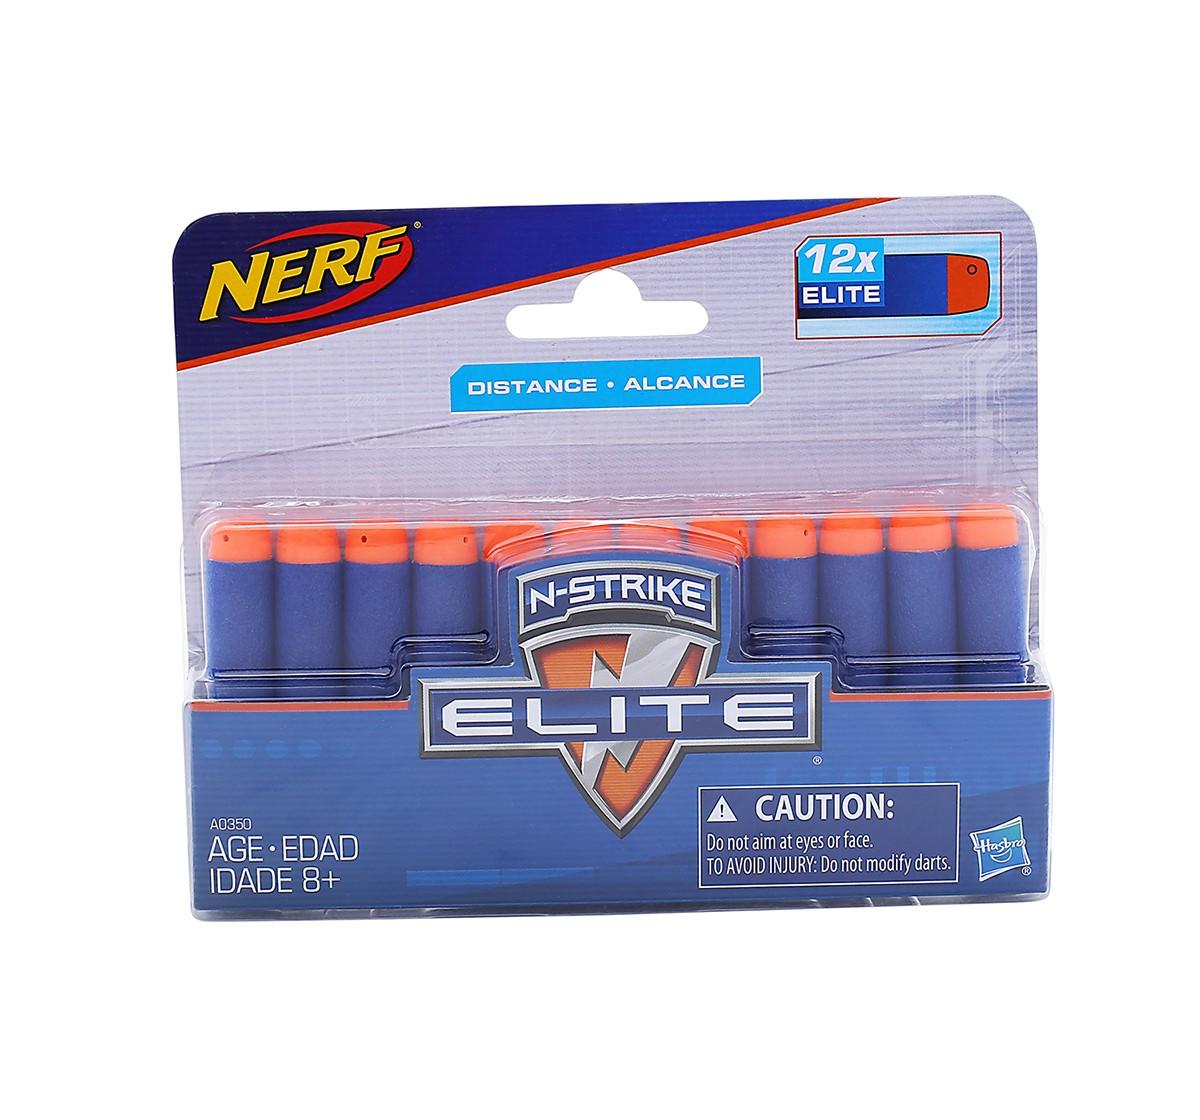 Nerf N-Strike Elite 12 Dart Refill Target Games and Darts for Kids age 8Y+ (Blue)